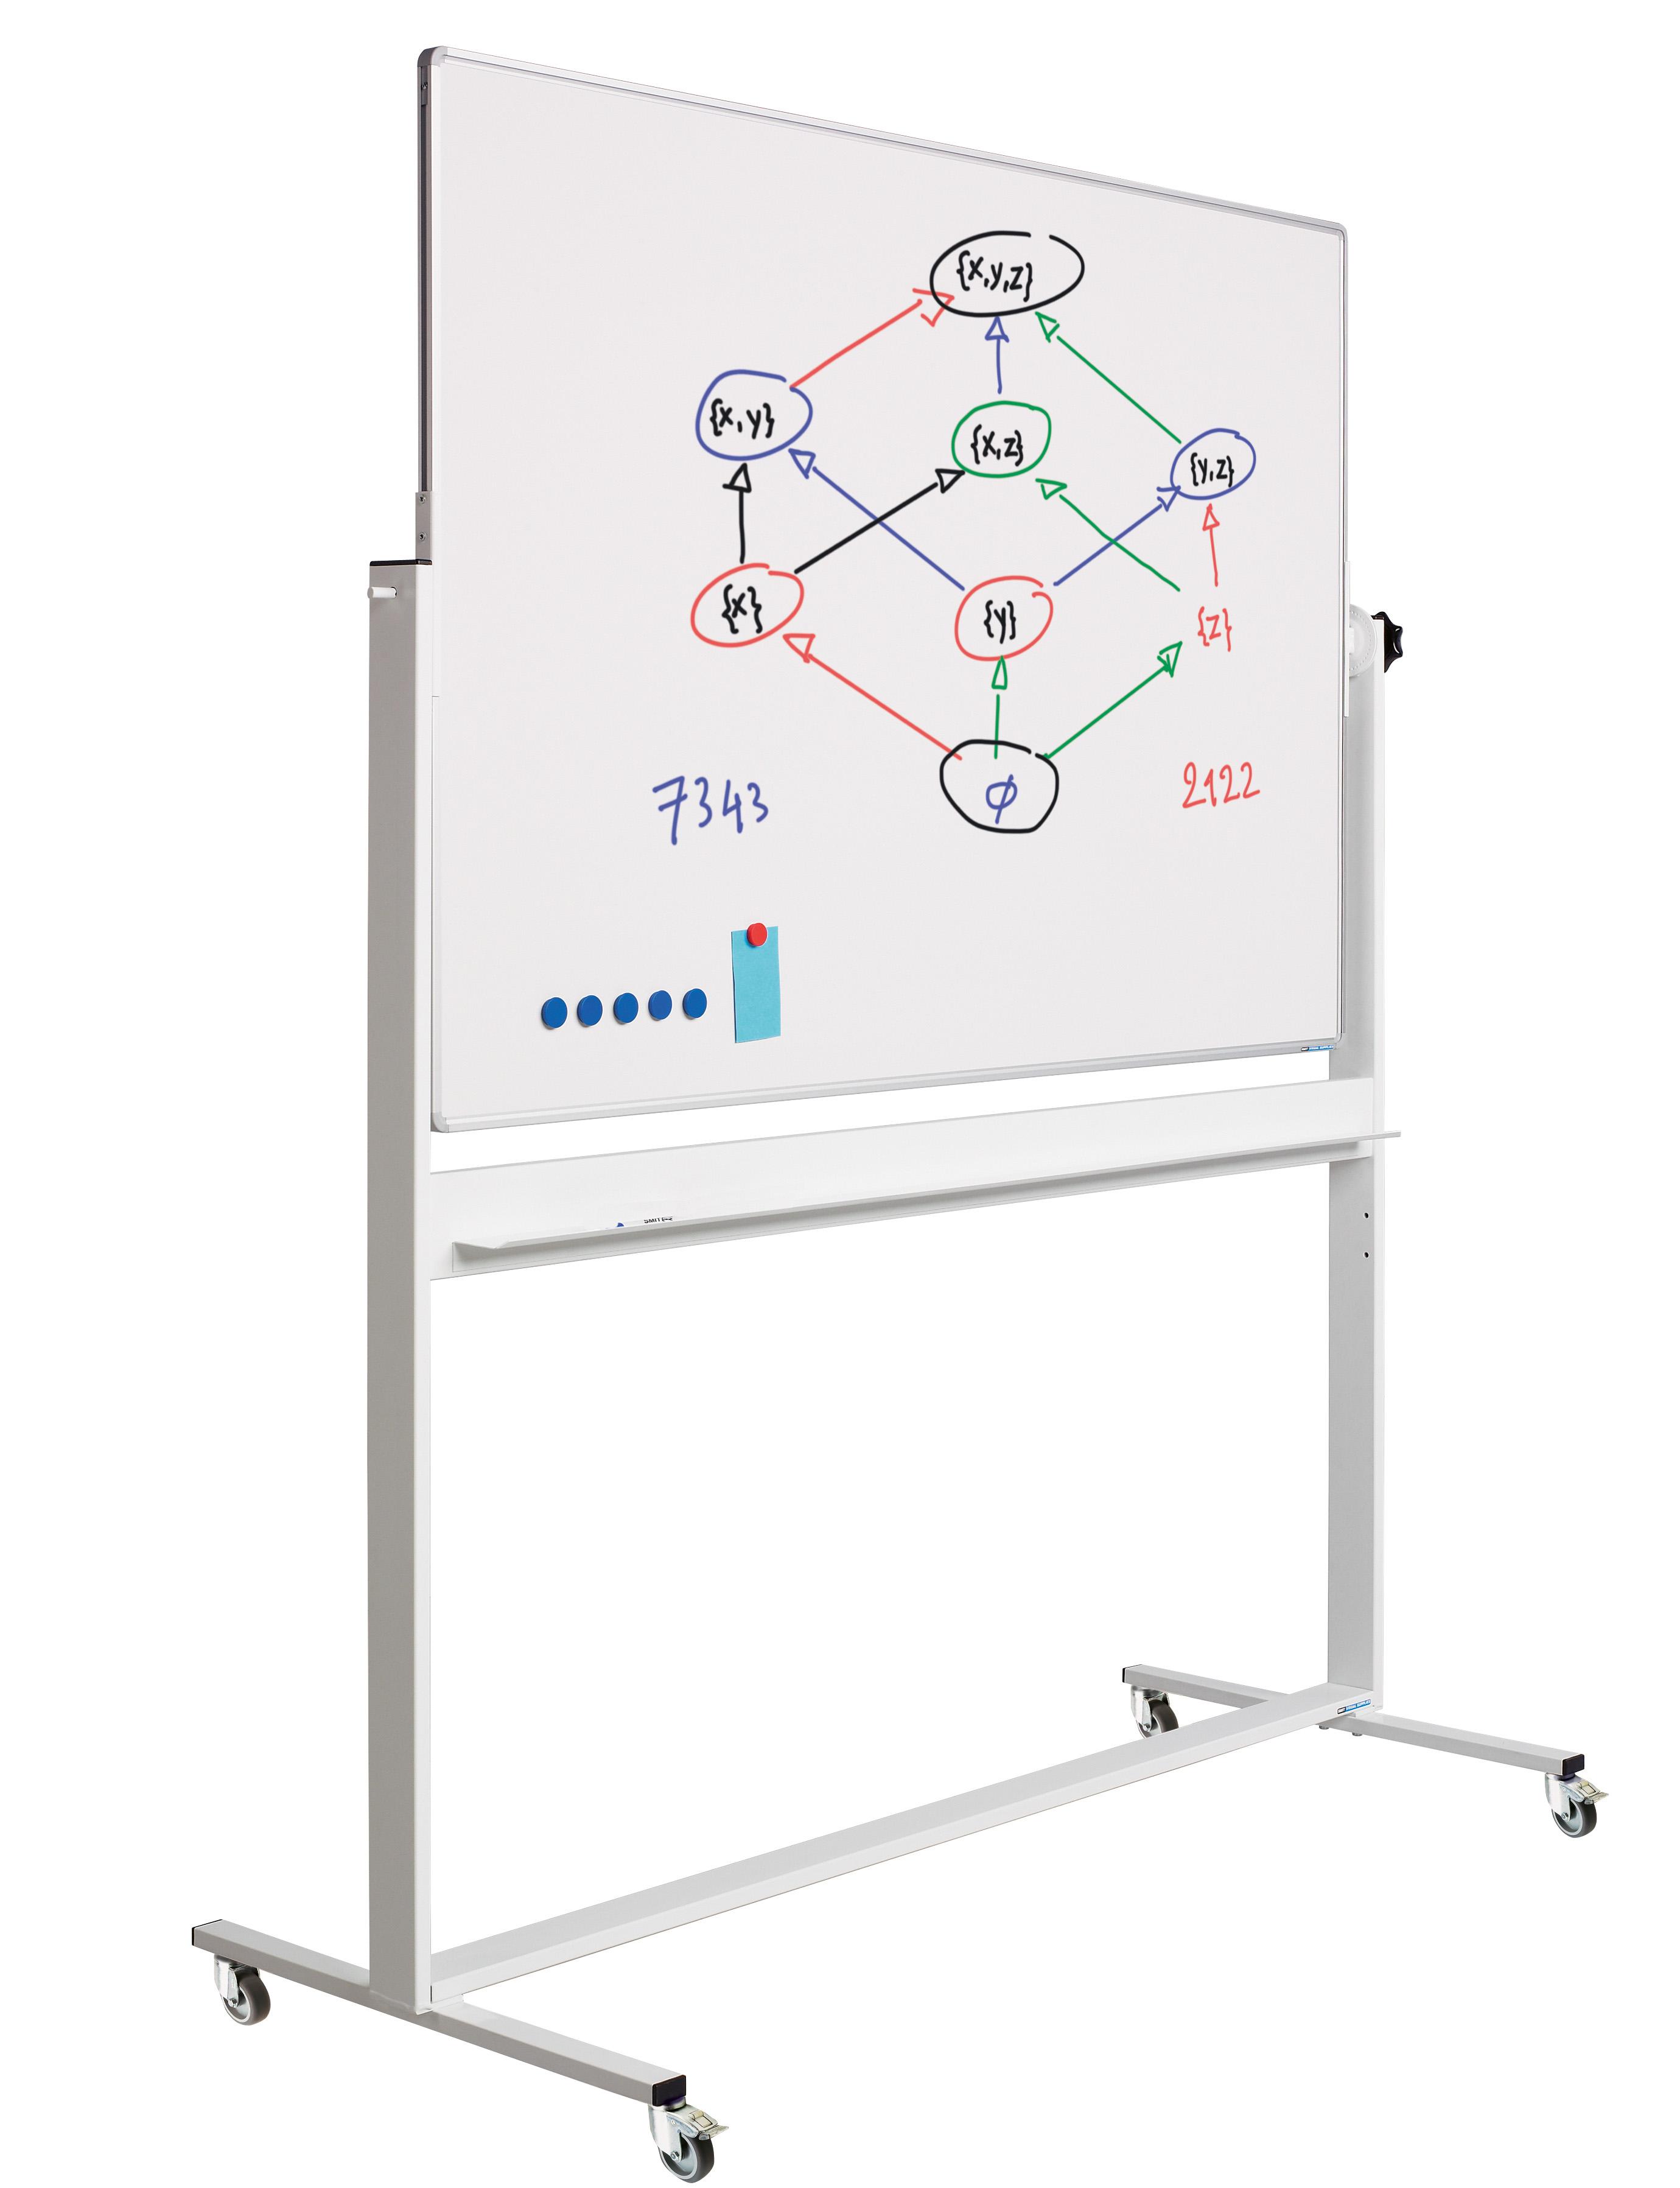 Kantelbord Standard RC10mm profiel, gelakt staal wit/wit-90x120 cm